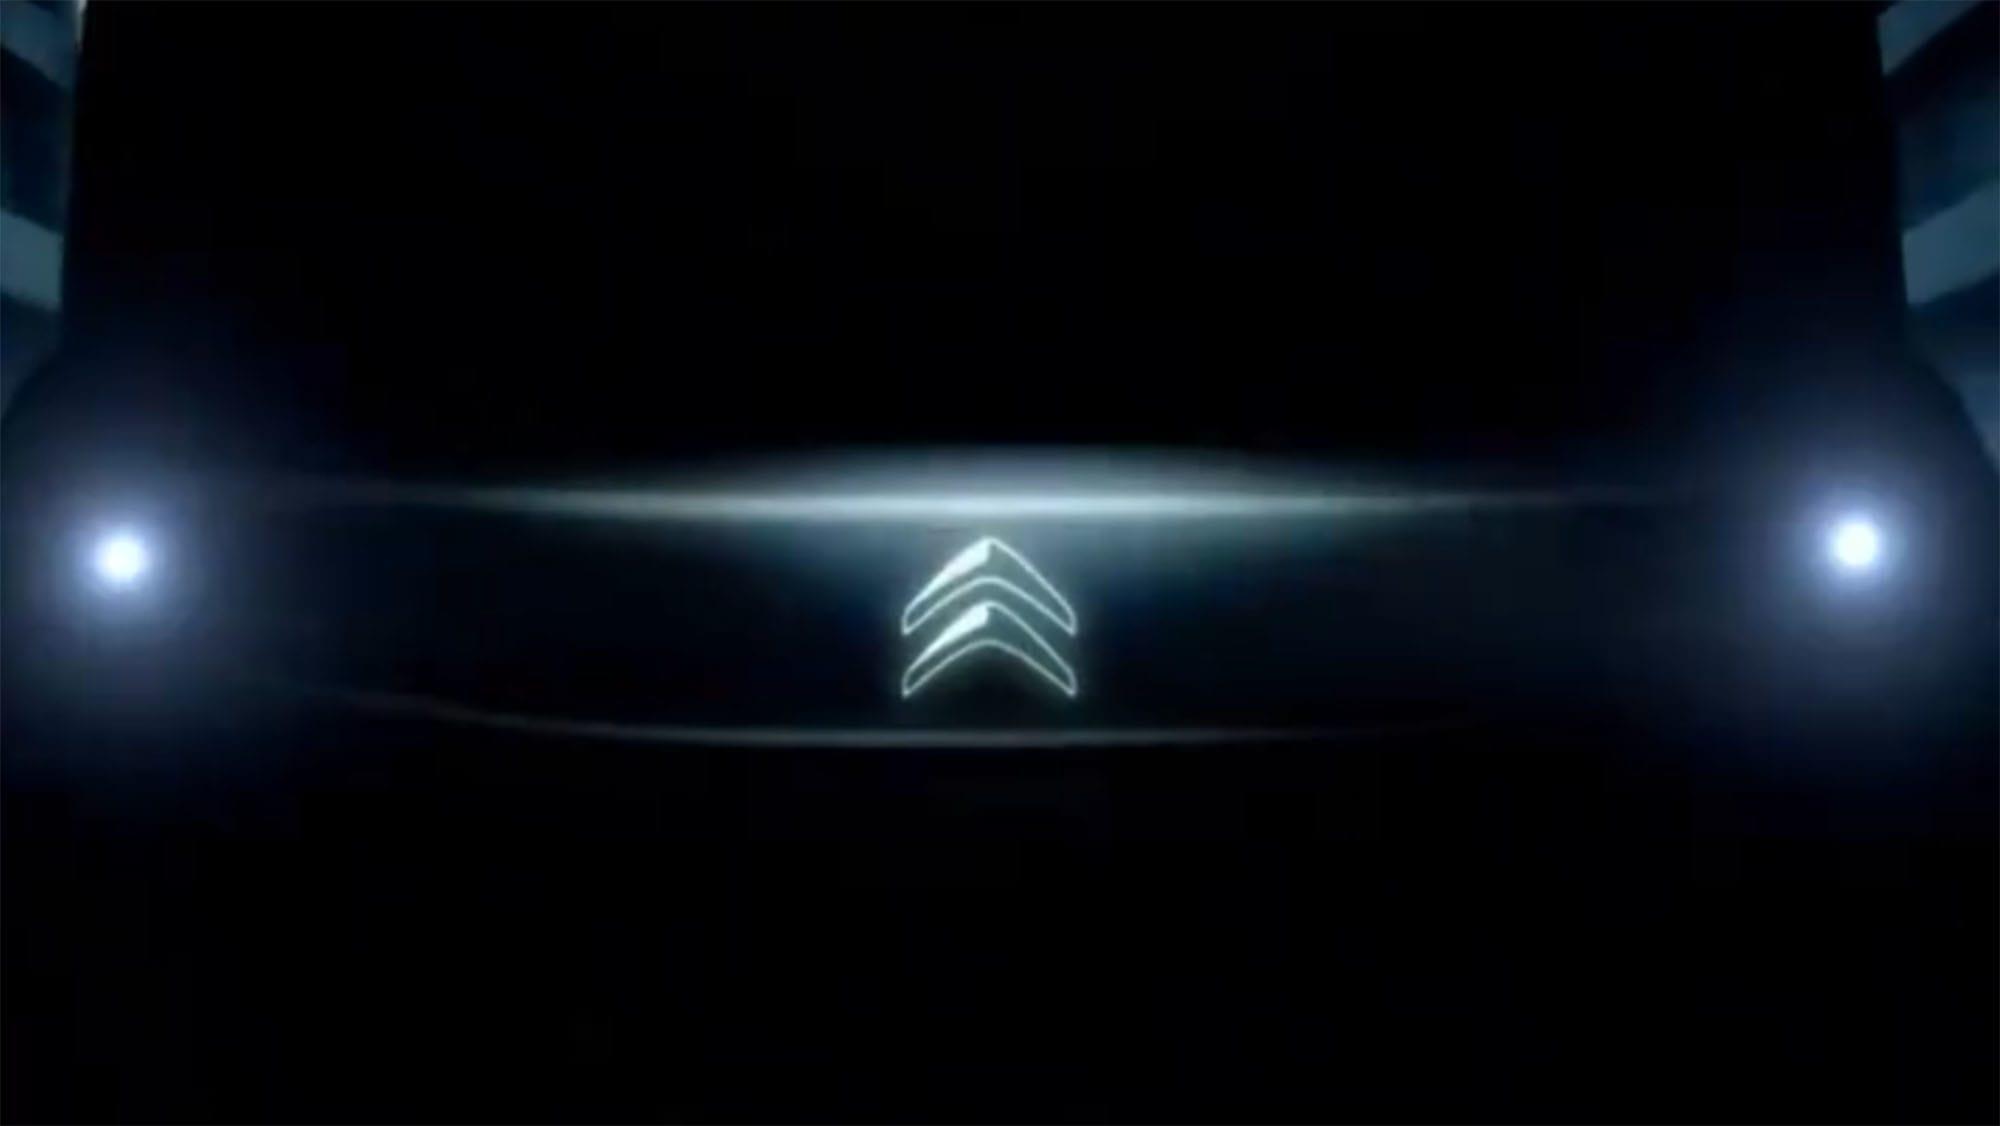 Citroen teases all-electric car, plans EV trek across Sahara